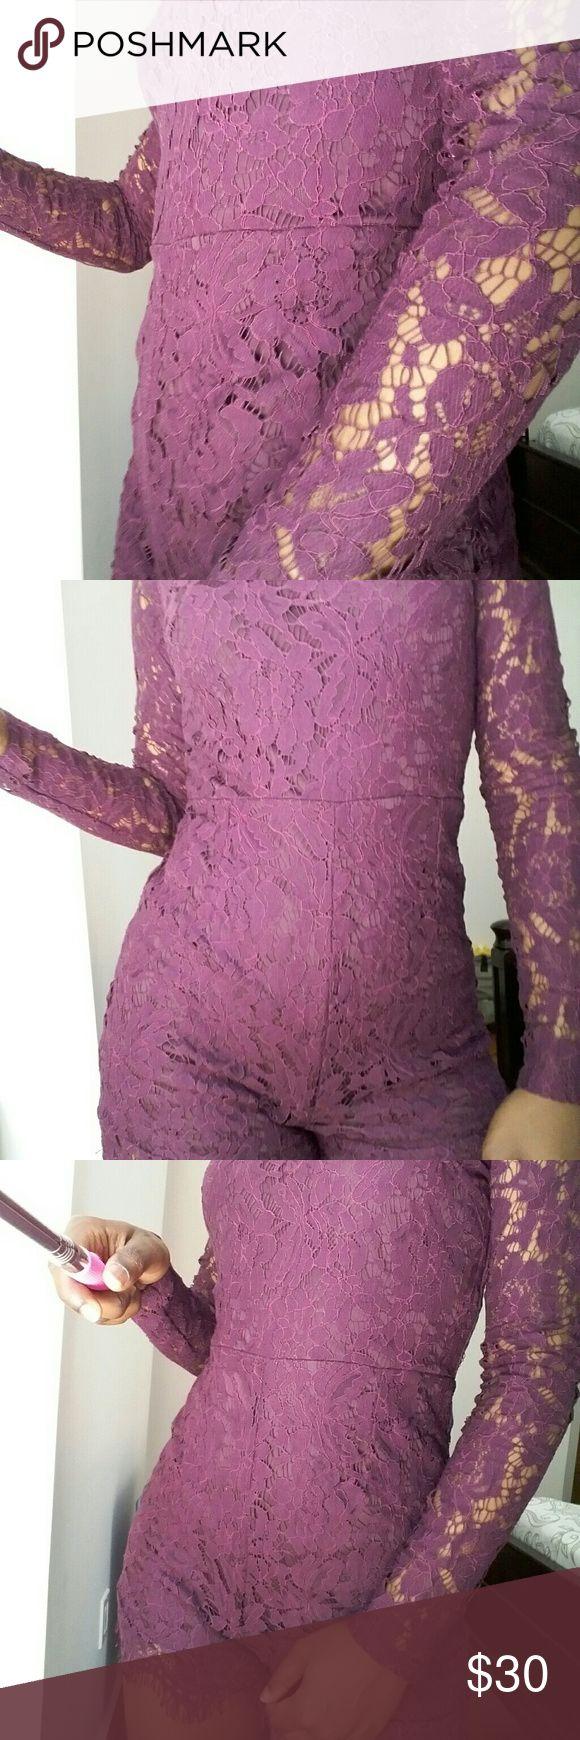 *FLASH SALE* HUGS YOUR CURVE DEEP PURPLE ROMPER Deep purple romper with lace sleeves Dresses